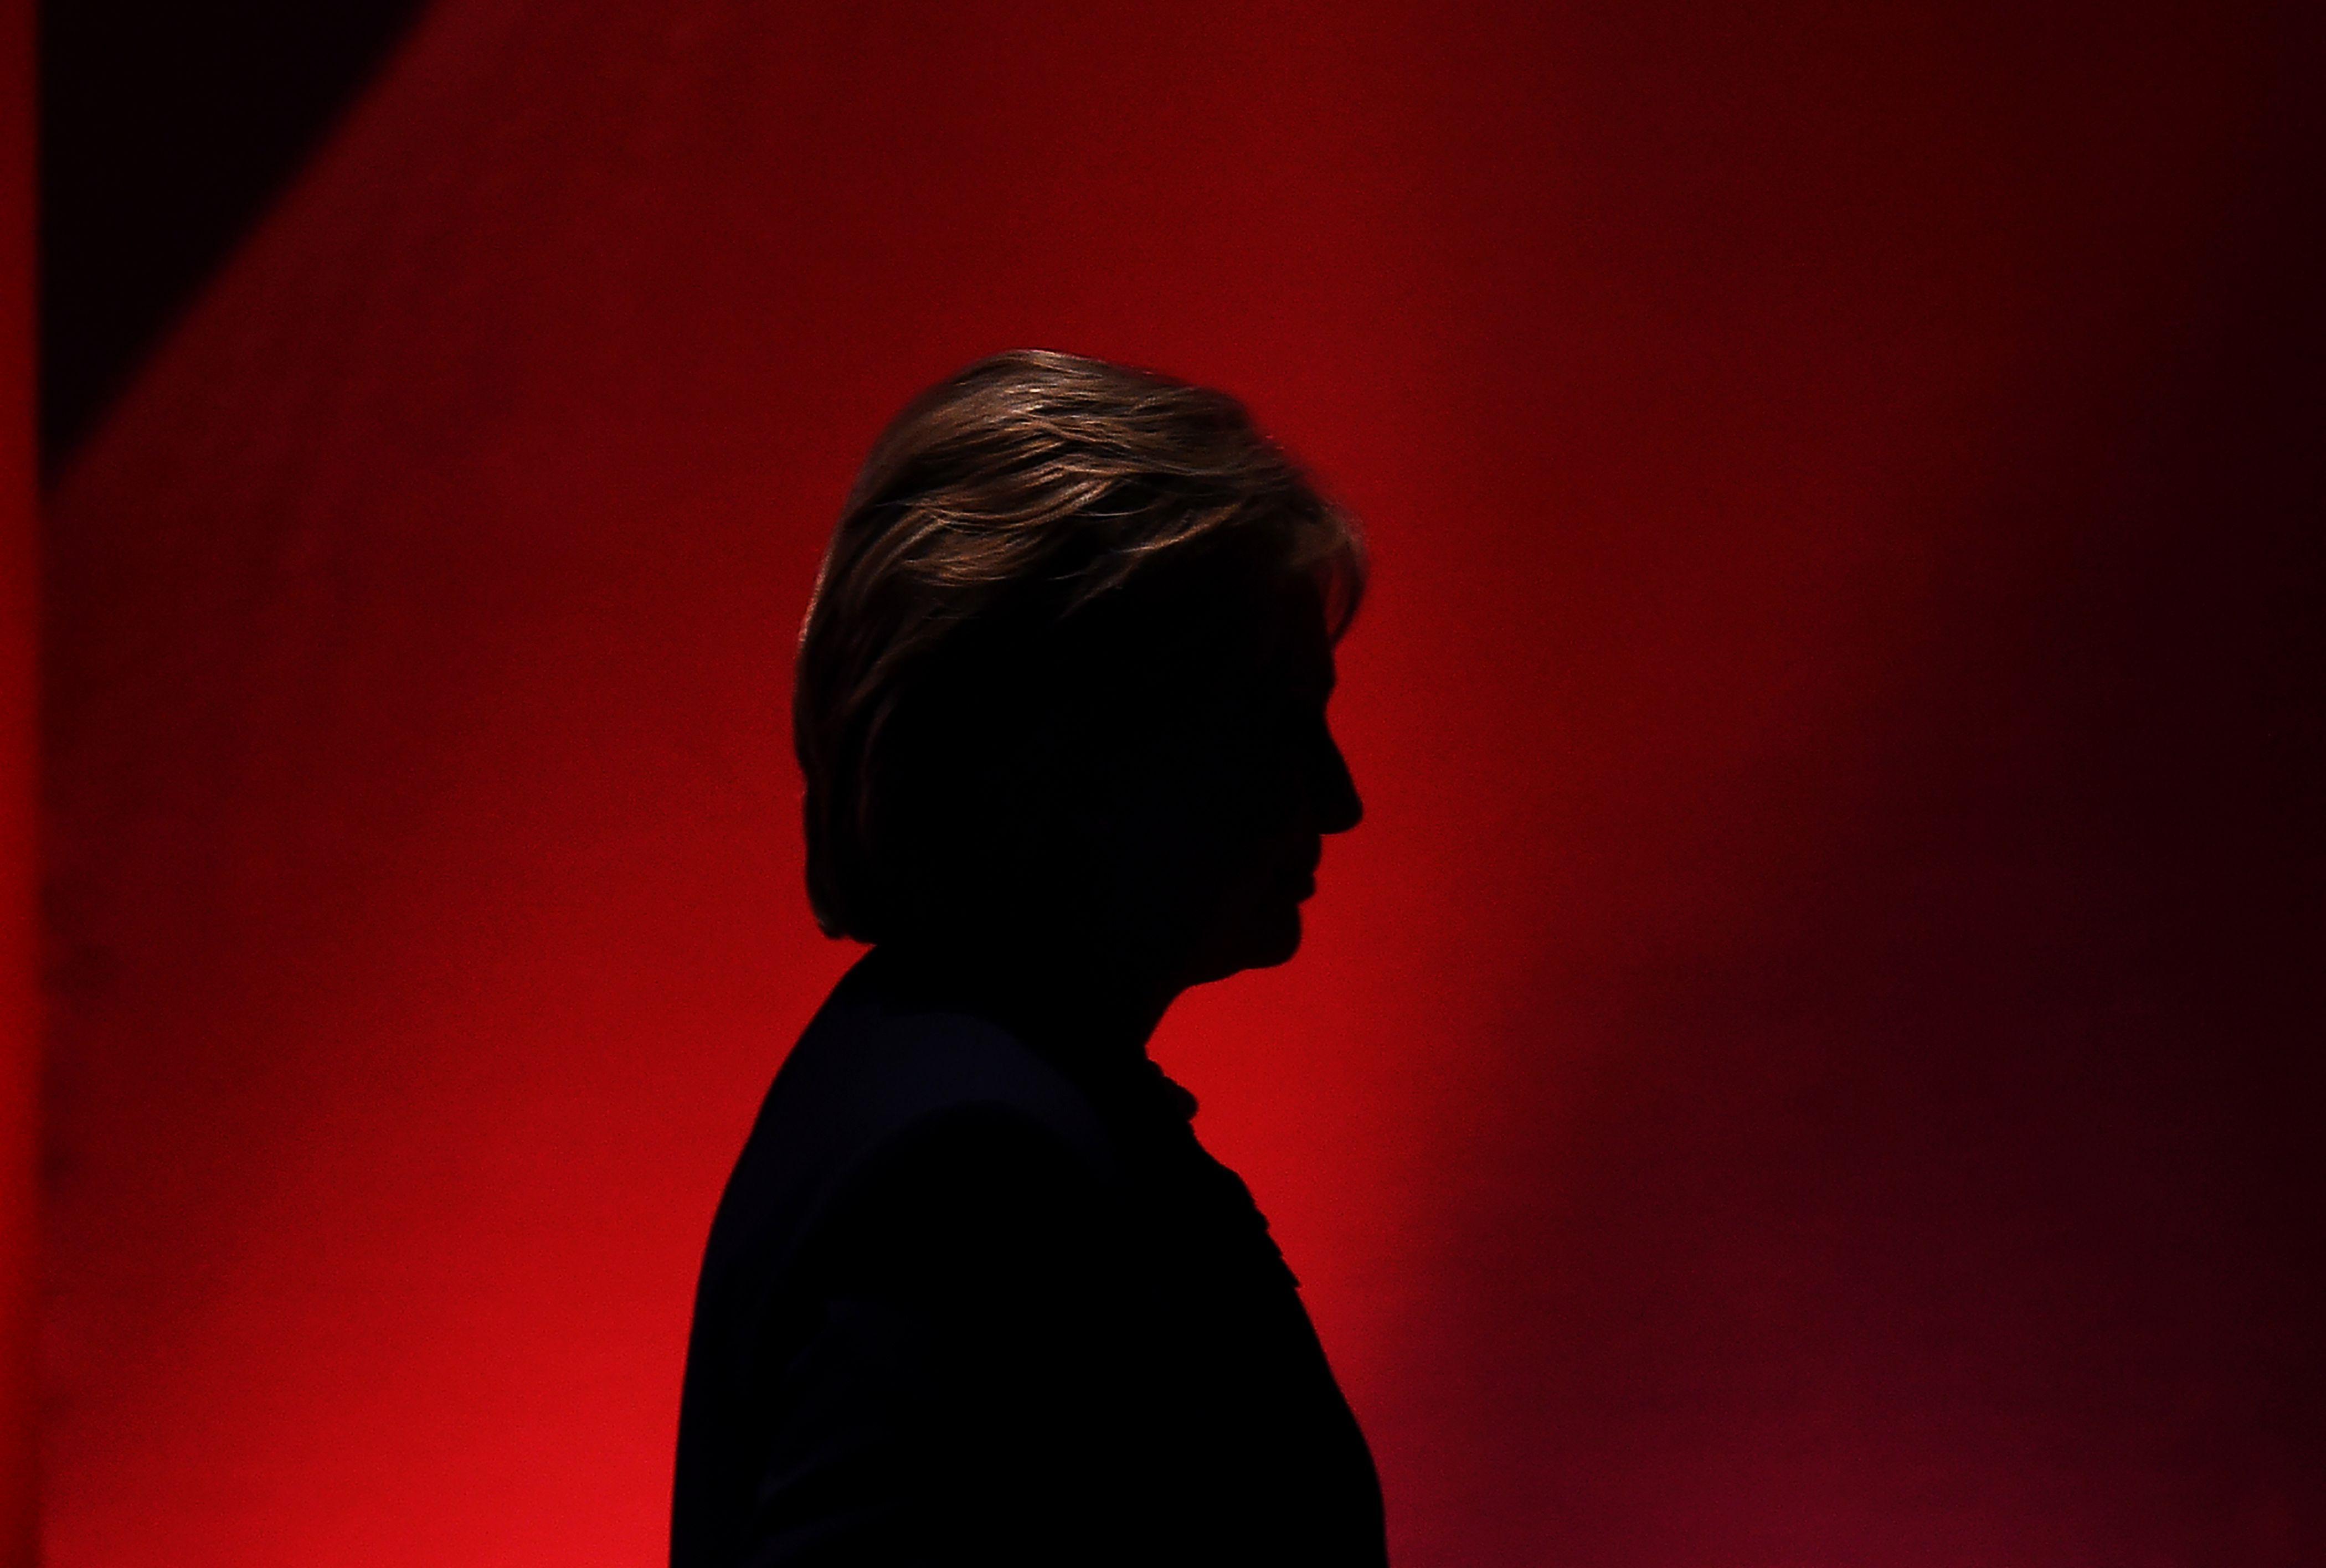 Clinton Campaign Does Damage Control After Sanders' Huge Upset